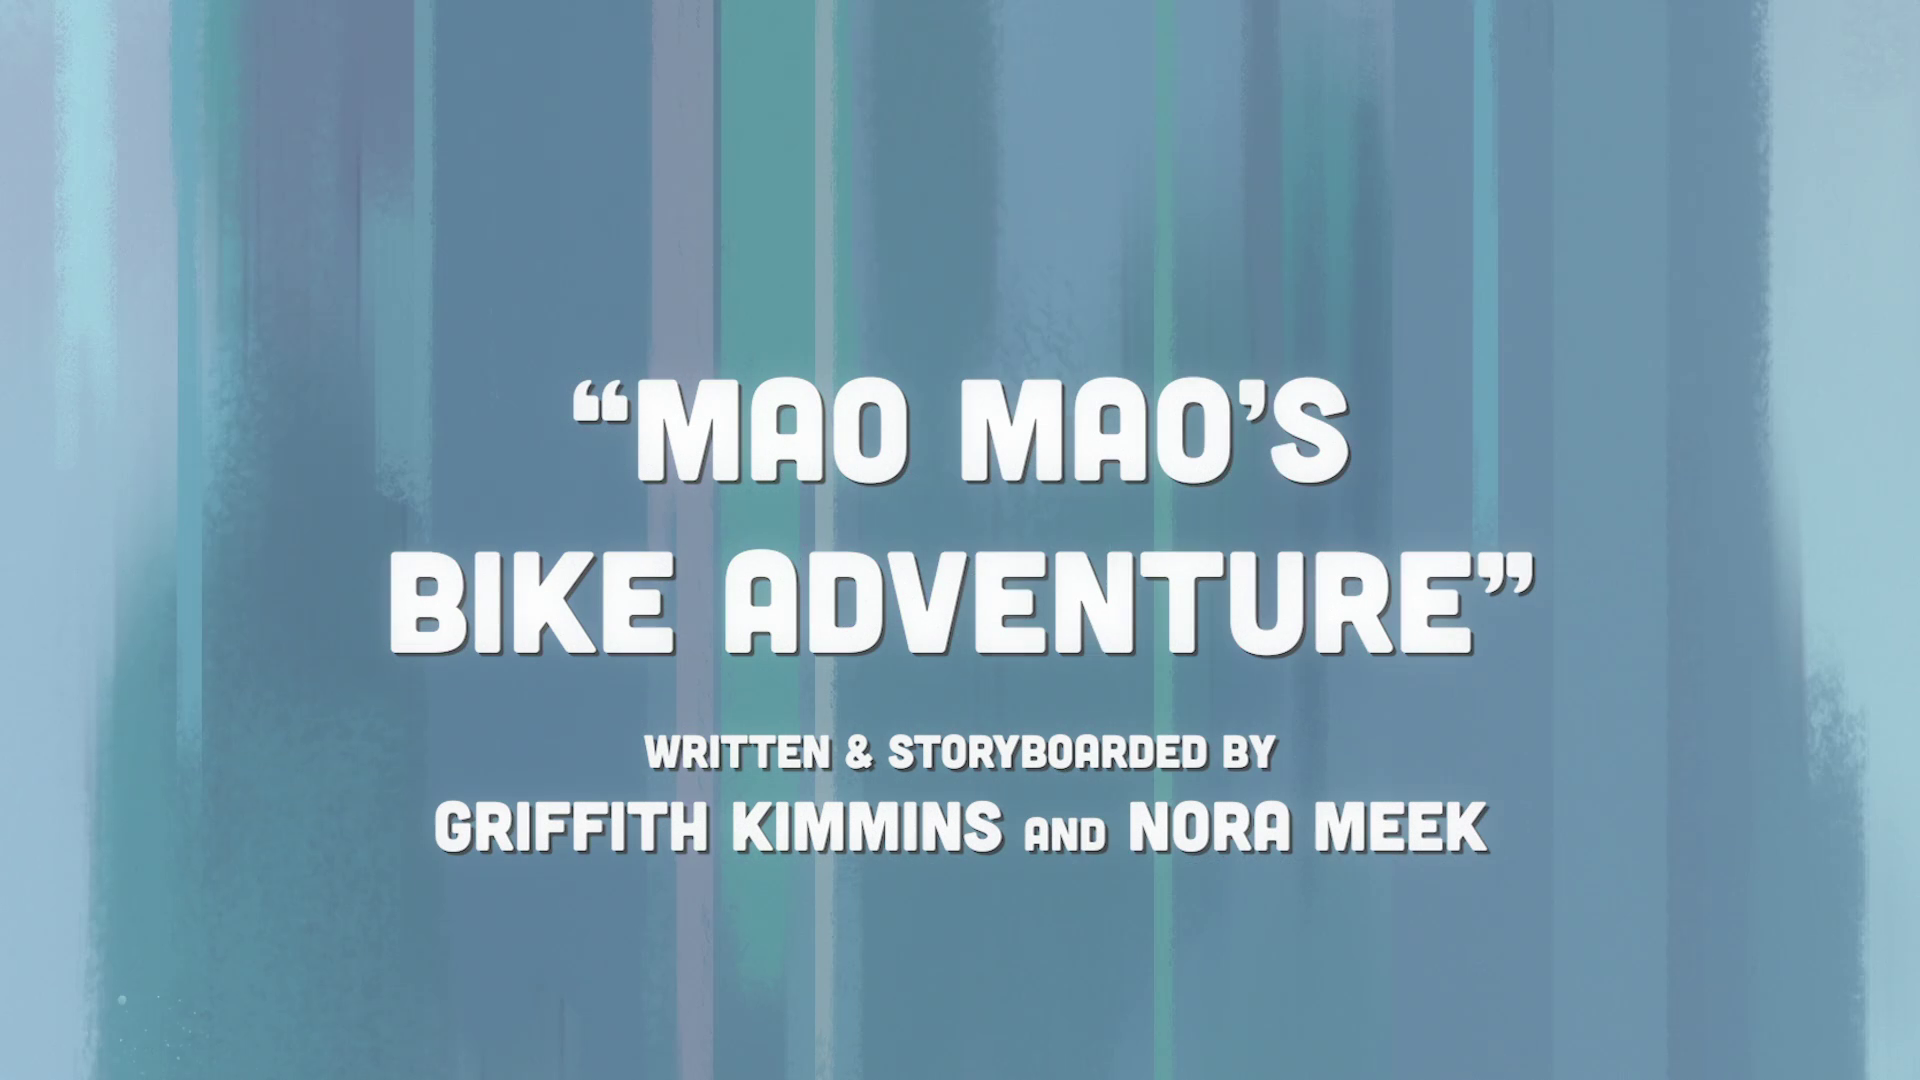 Mao Mao's Bike Adventure/Gallery